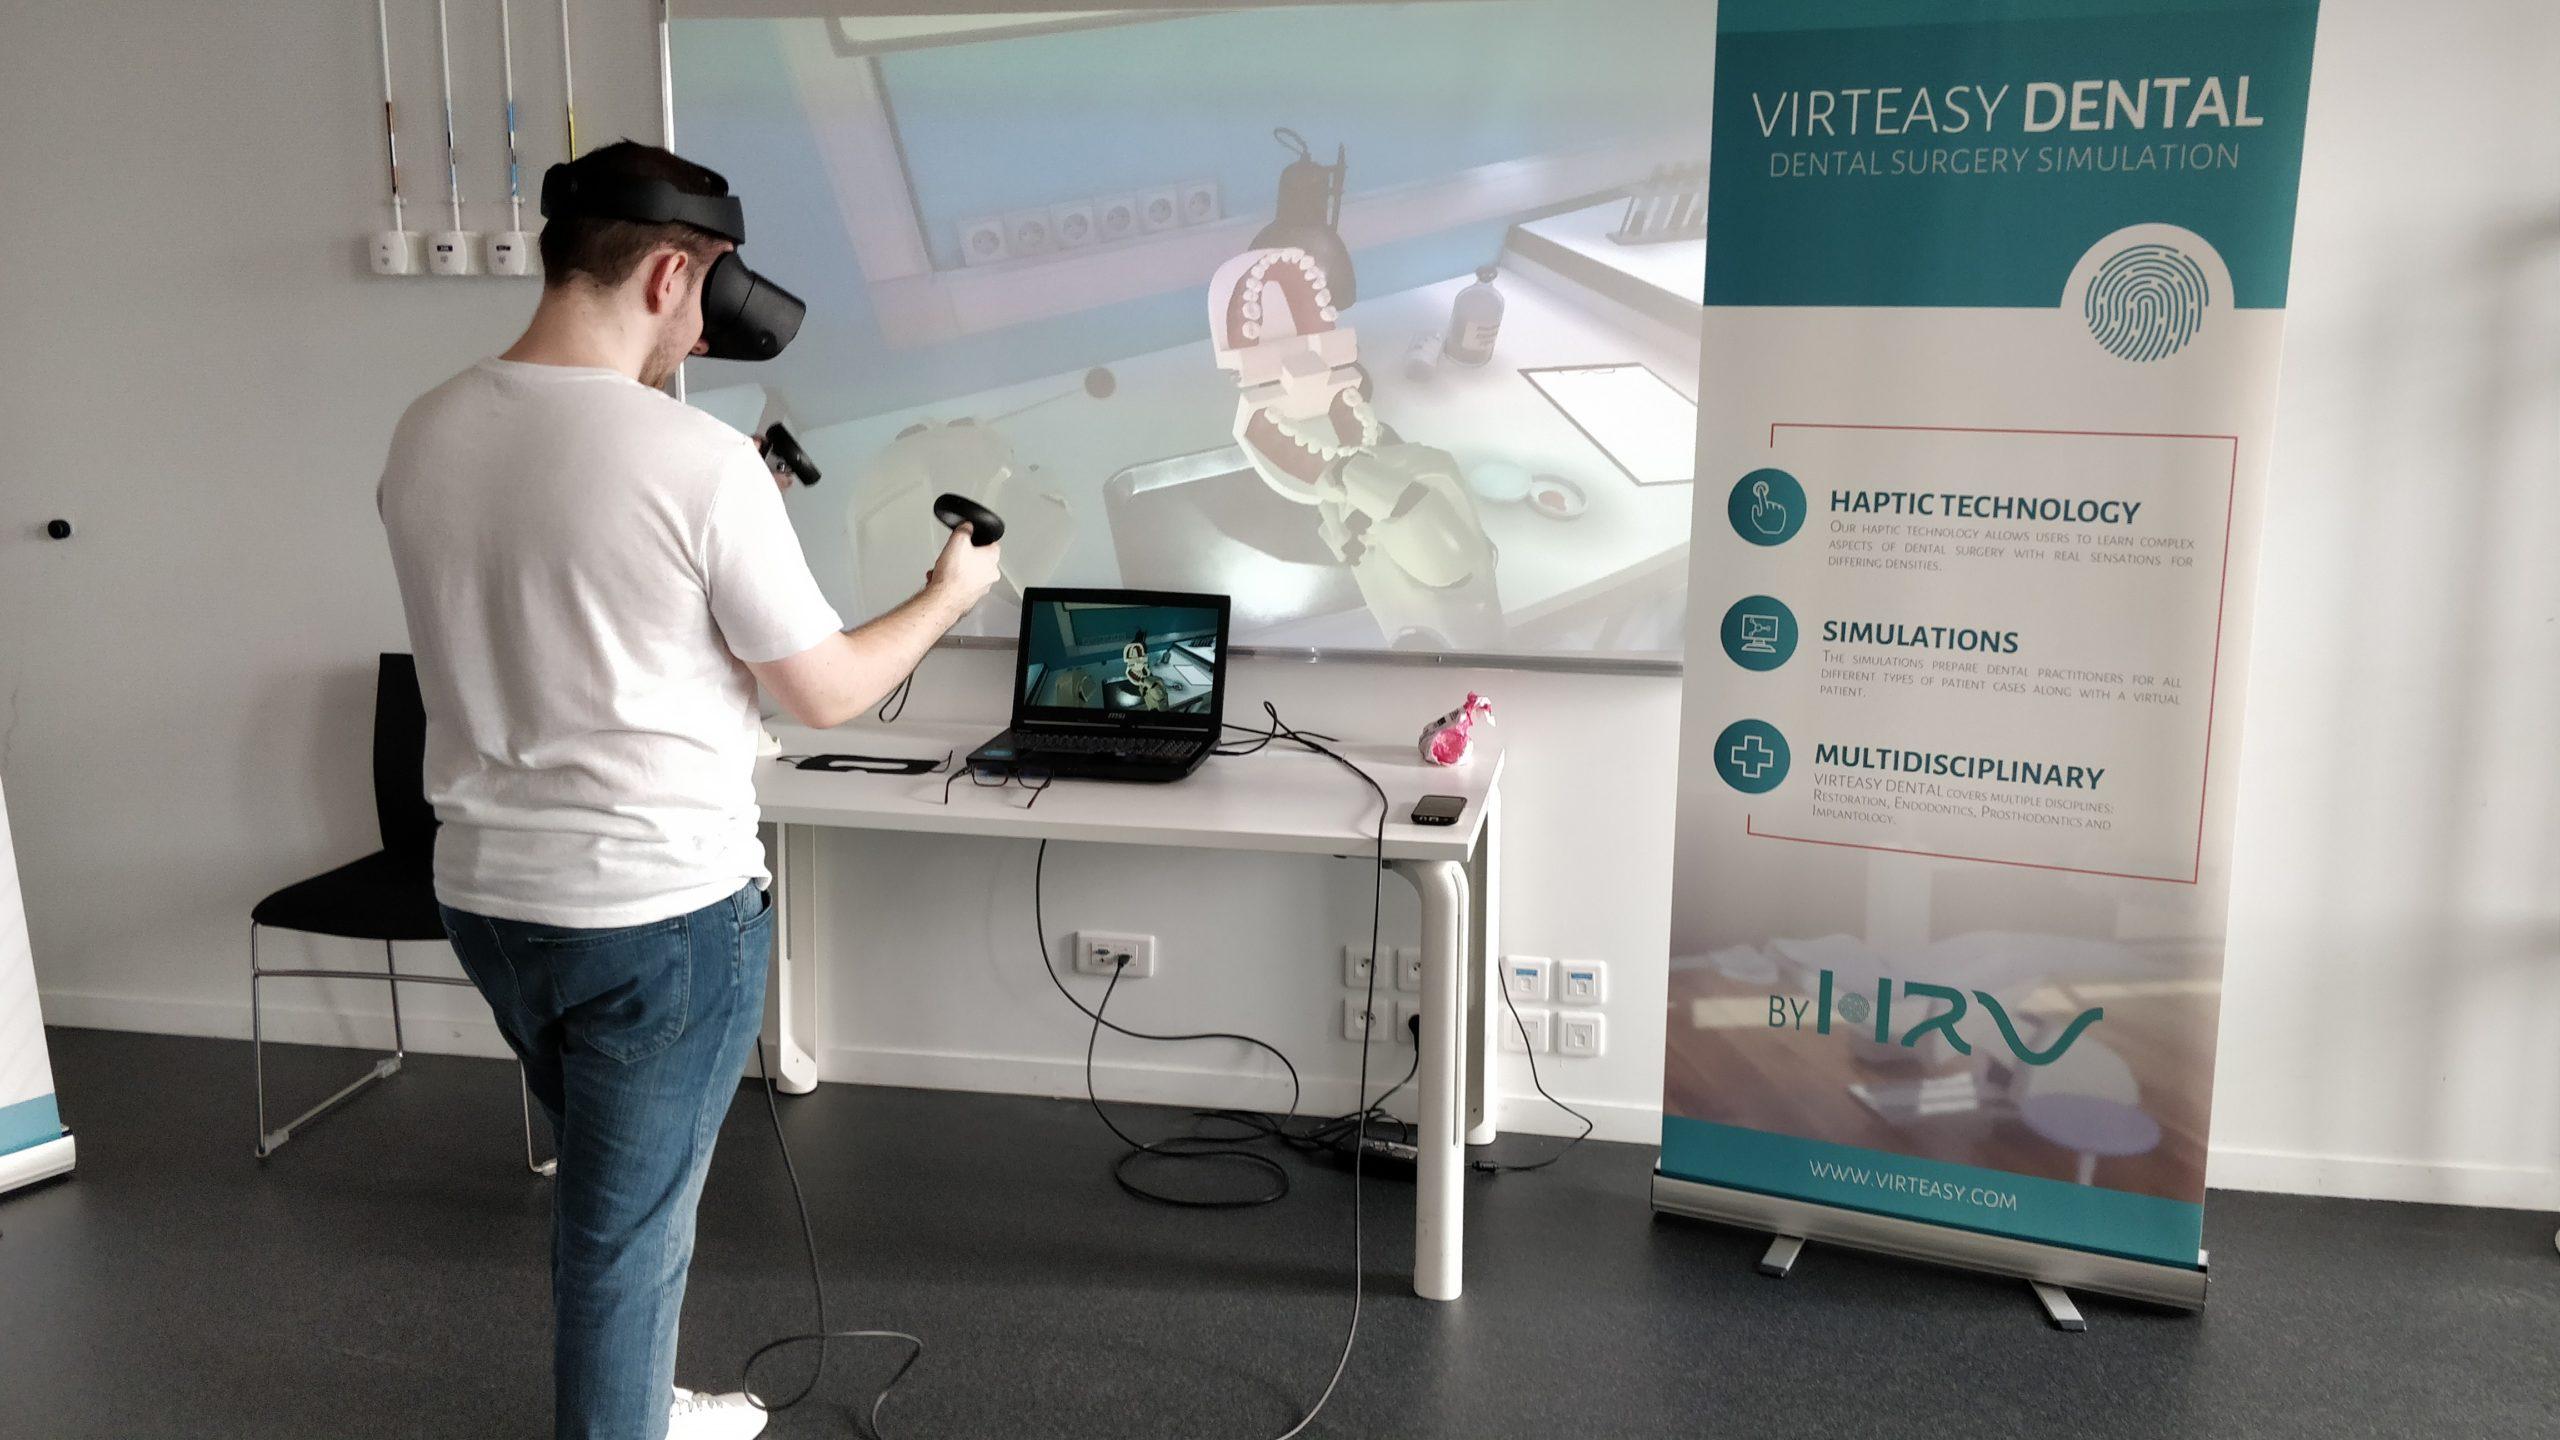 Man_Demo VR Virteasy Dental Unreal Engine